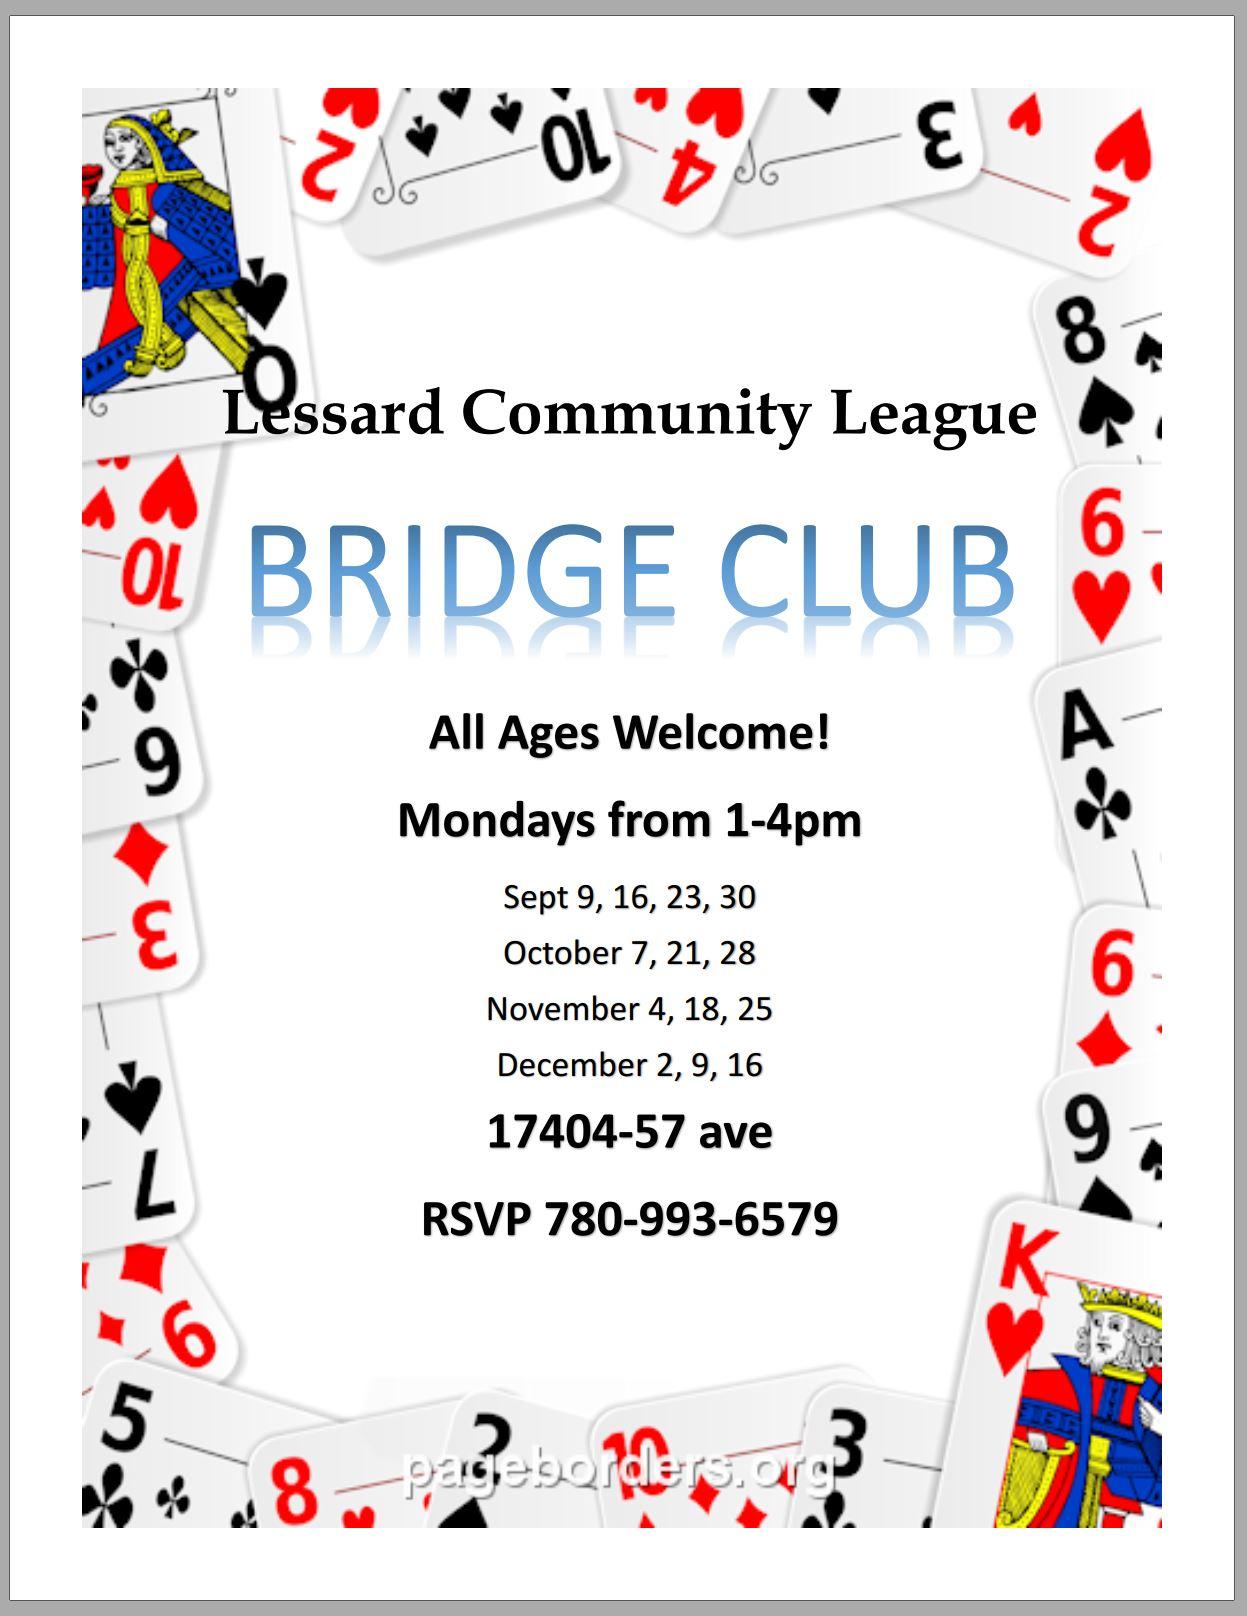 bridgeclub.JPG